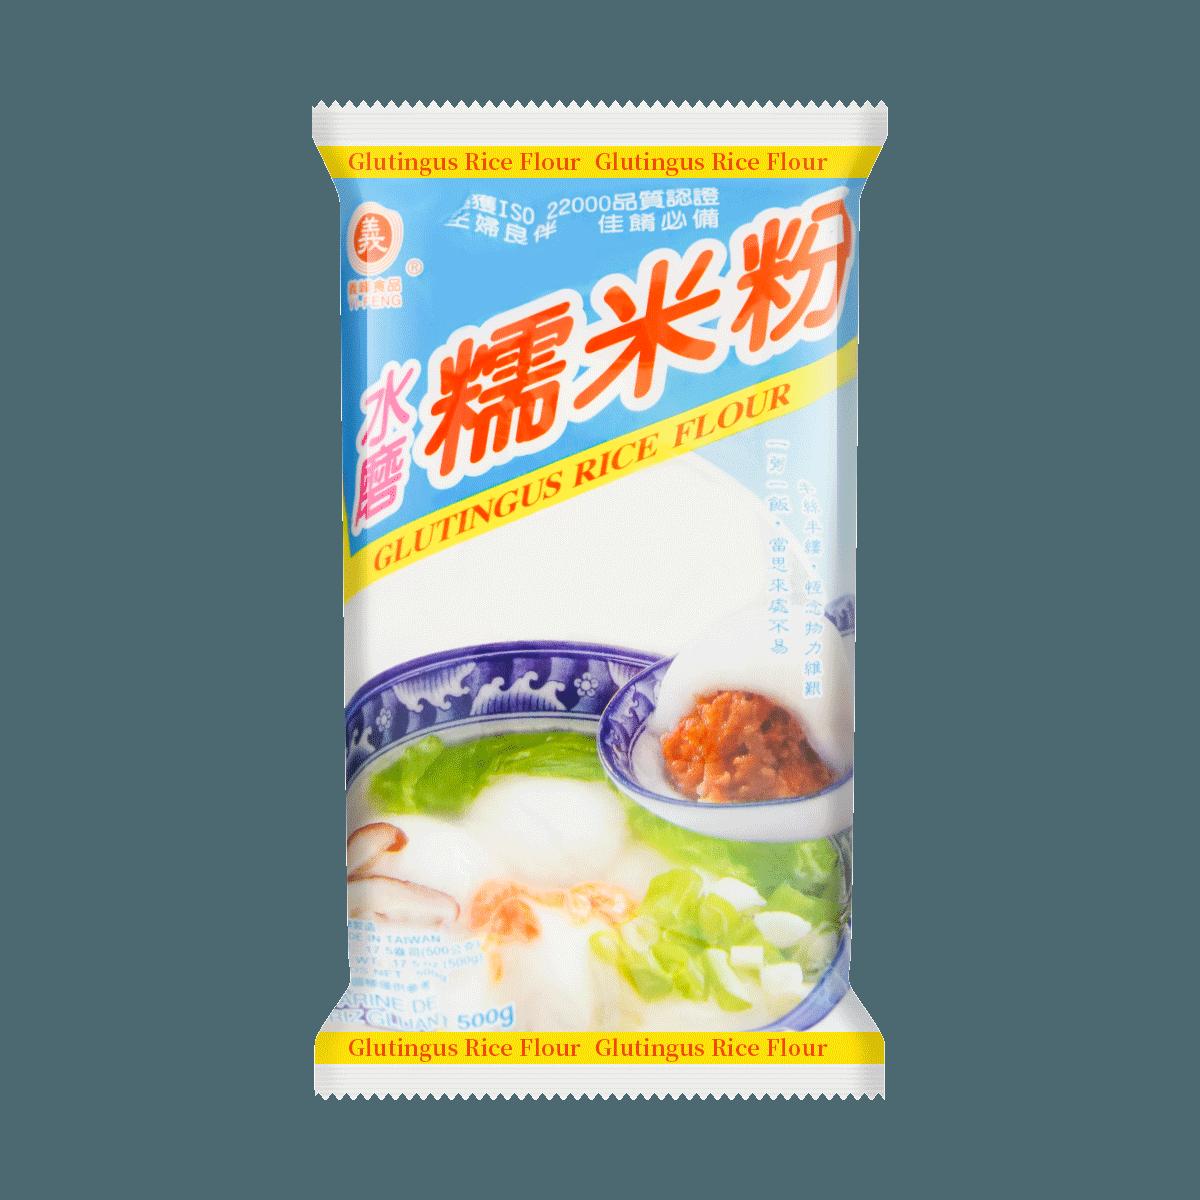 Yamibuy.com:Customer reviews:YI FENG Gletingus Rice Flour 500g